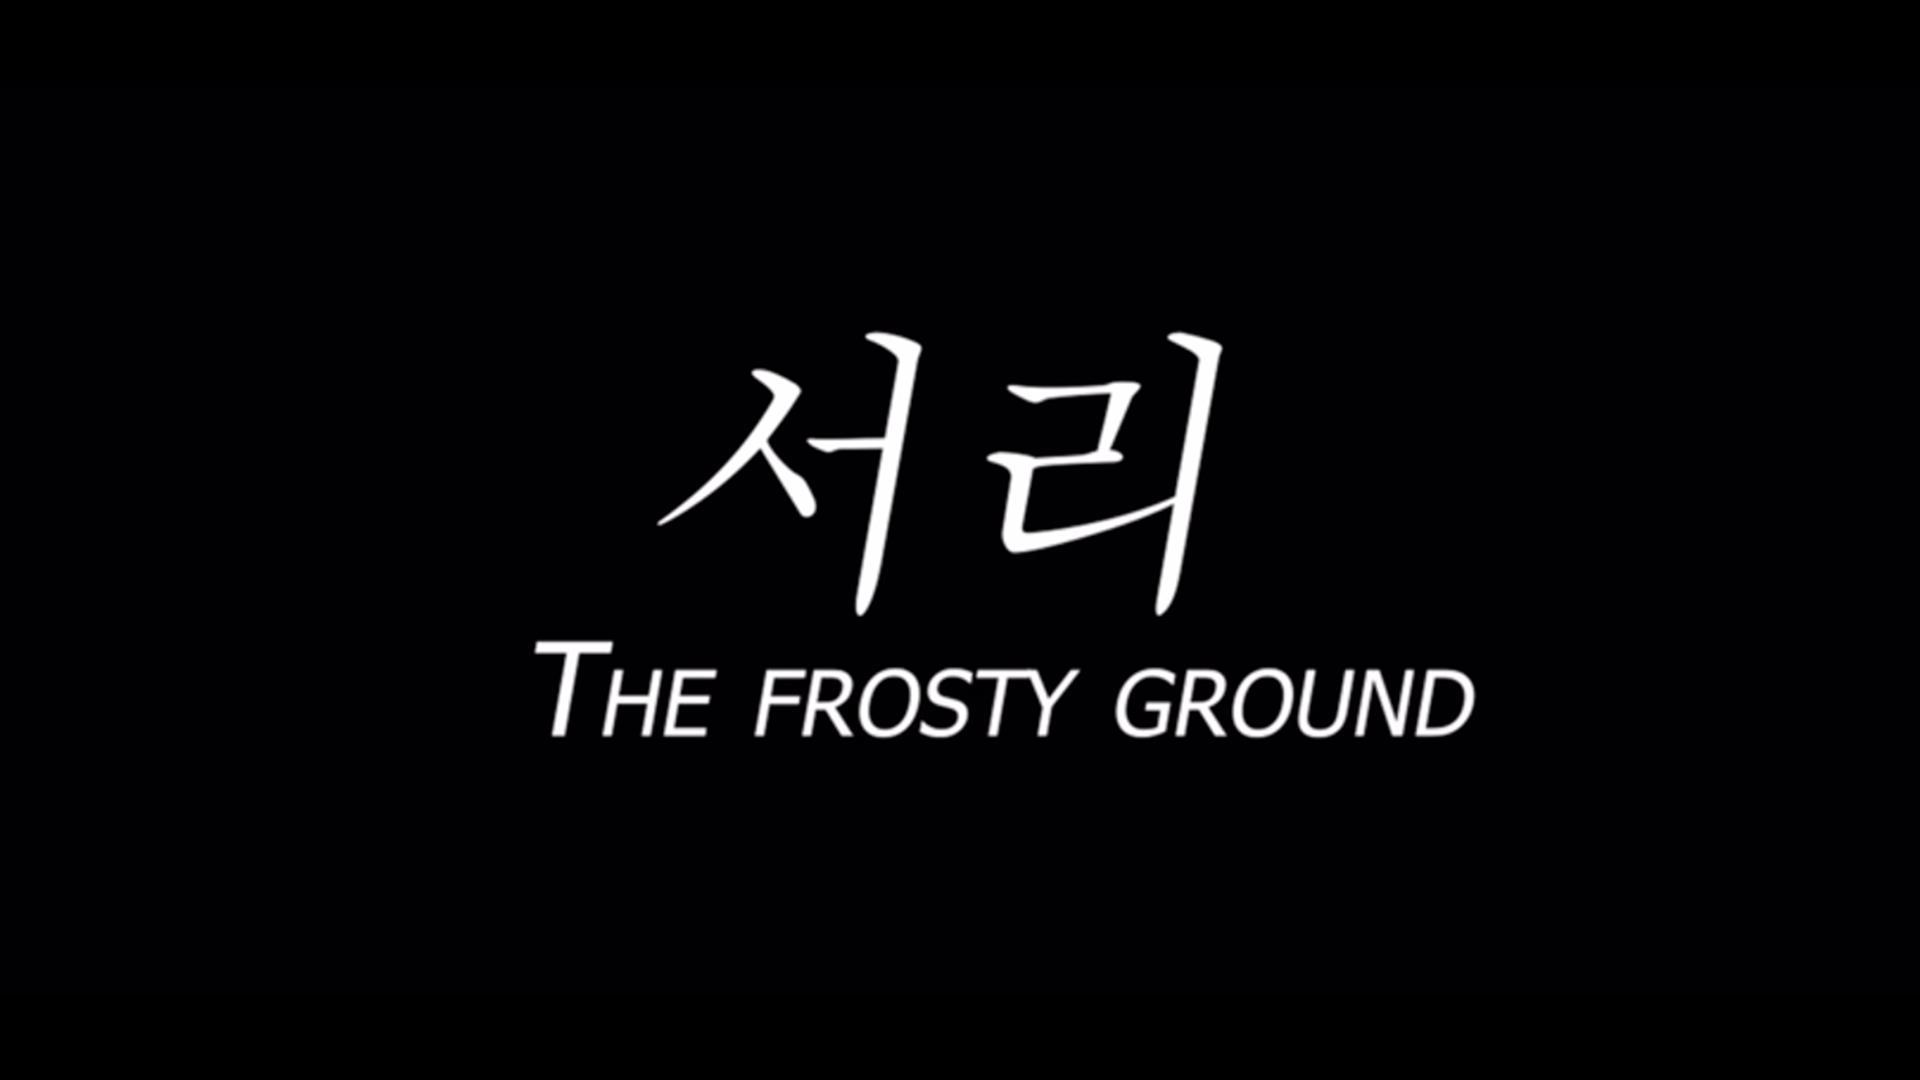 The frosty ground